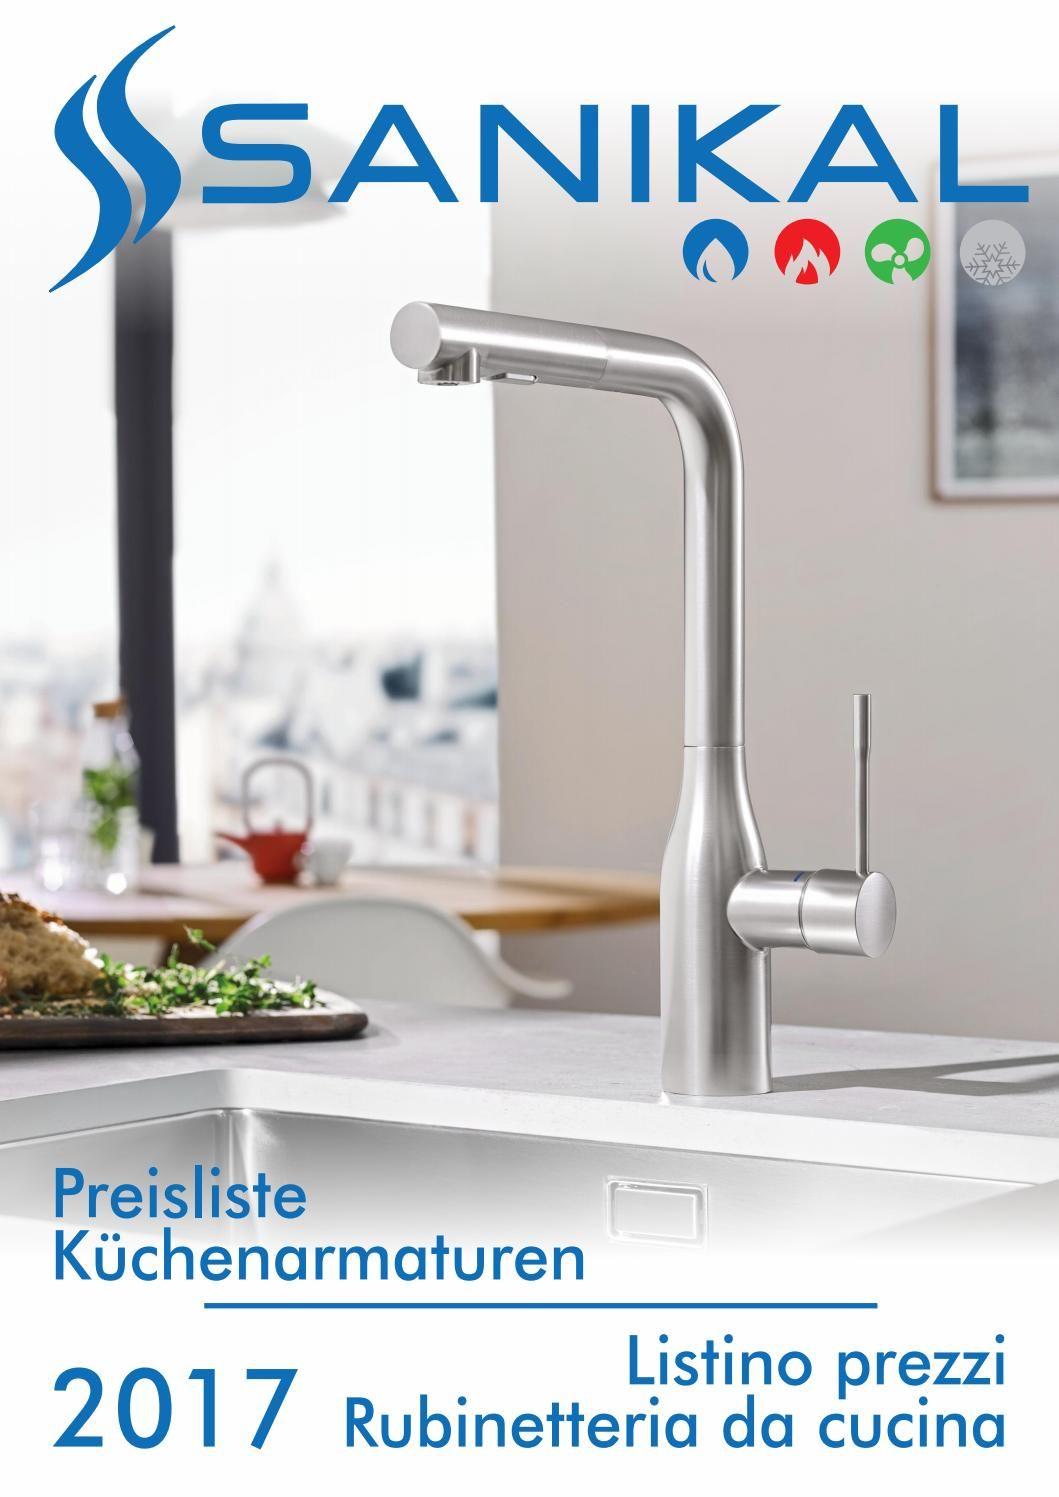 2017 Preisliste Küchenarmaturen Listino rubinetteria cucina